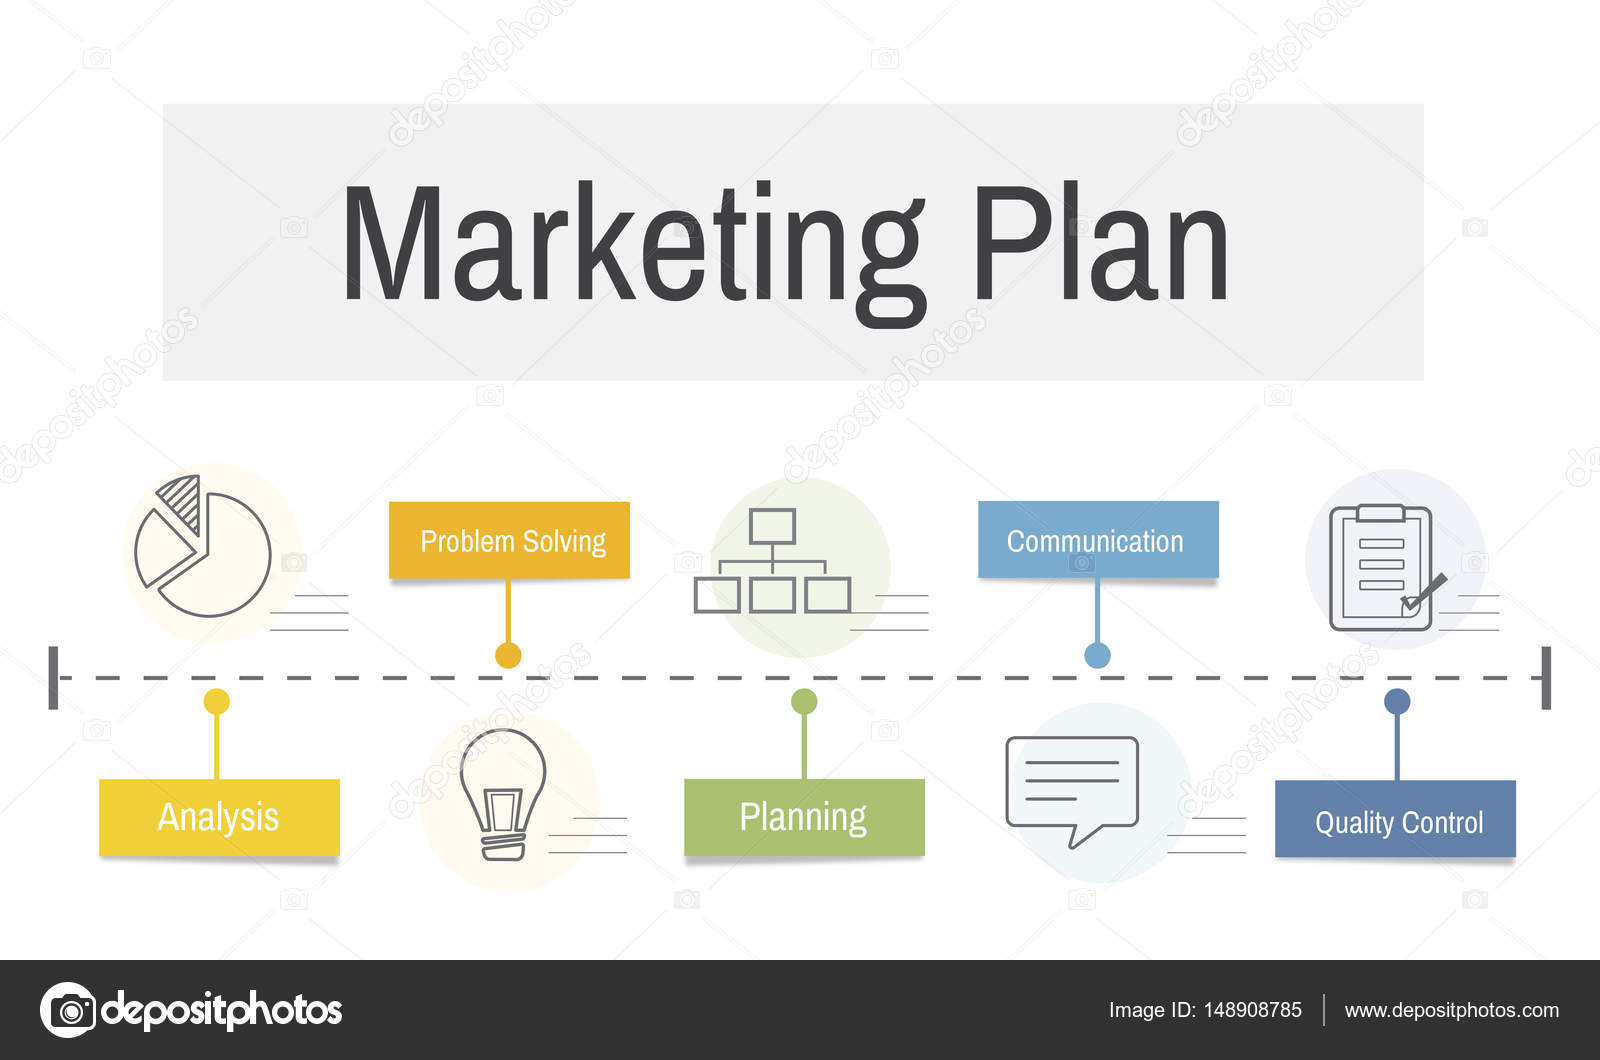 Vorlage mit marketing-Plan-Konzept — Stockfoto © Rawpixel #148908785